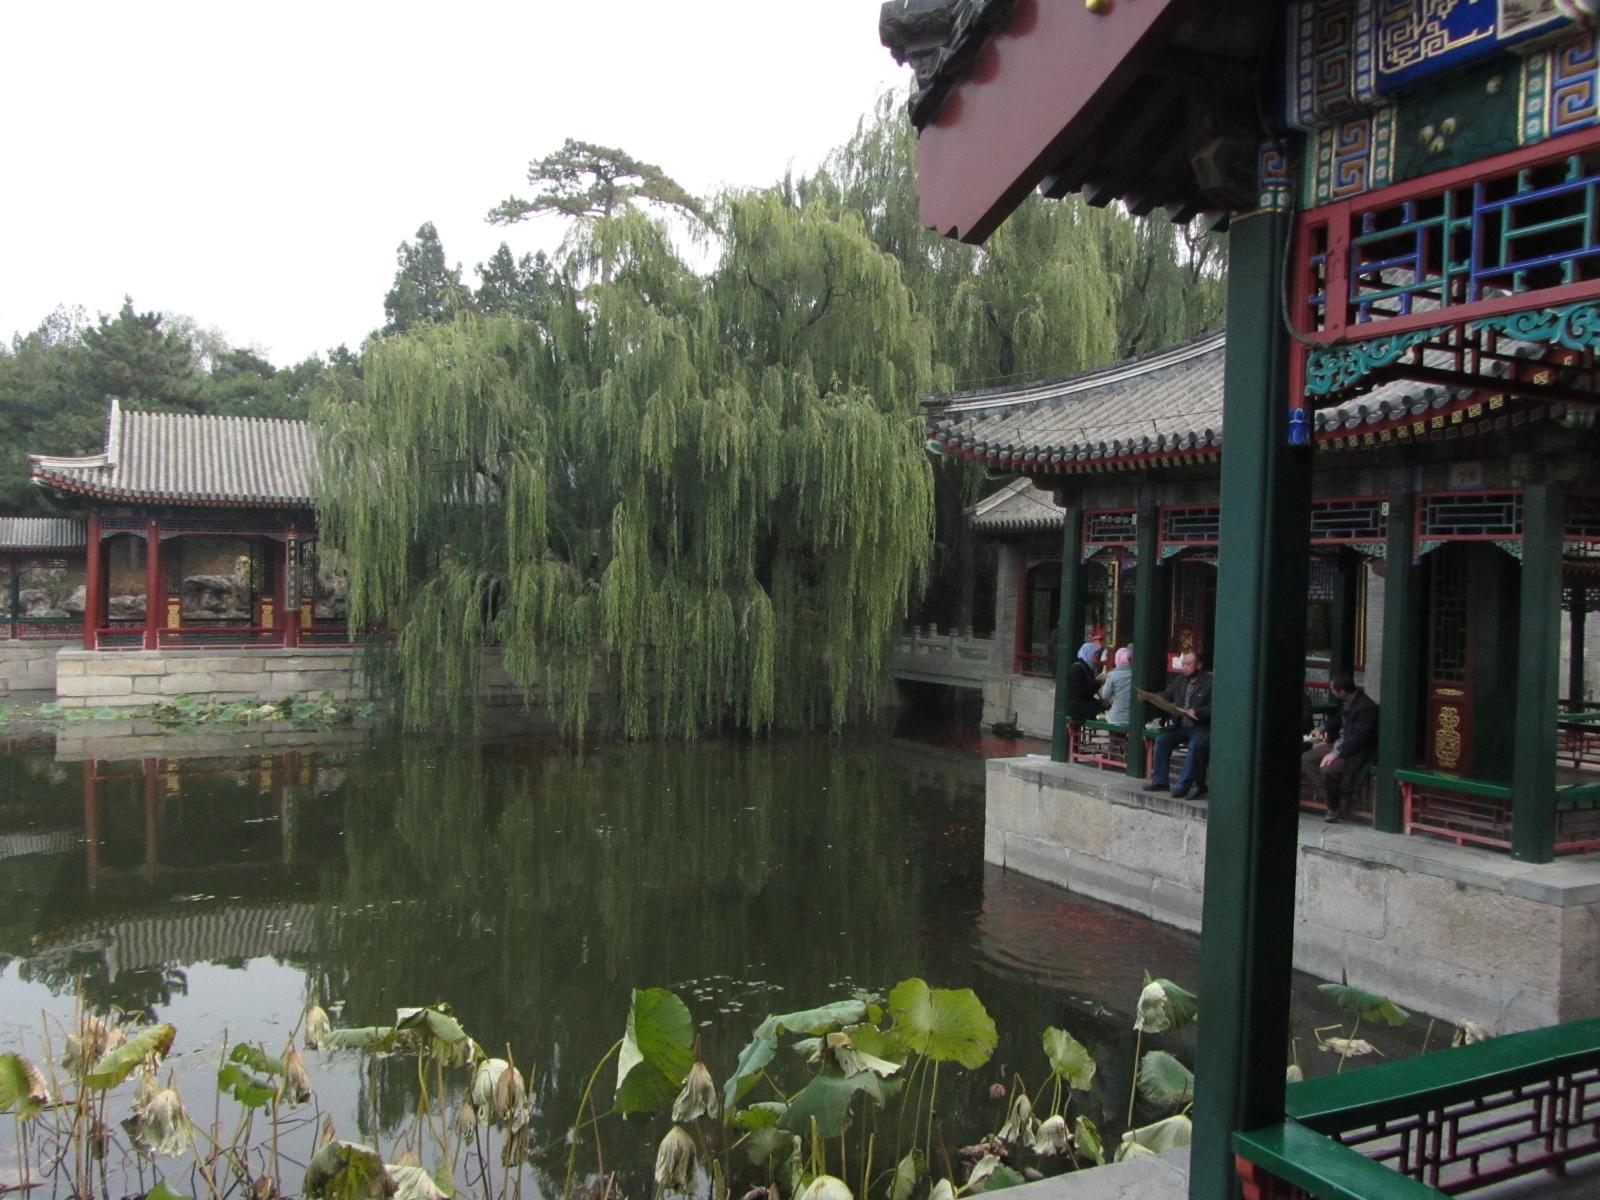 jardin de l'harmonie vertueuse